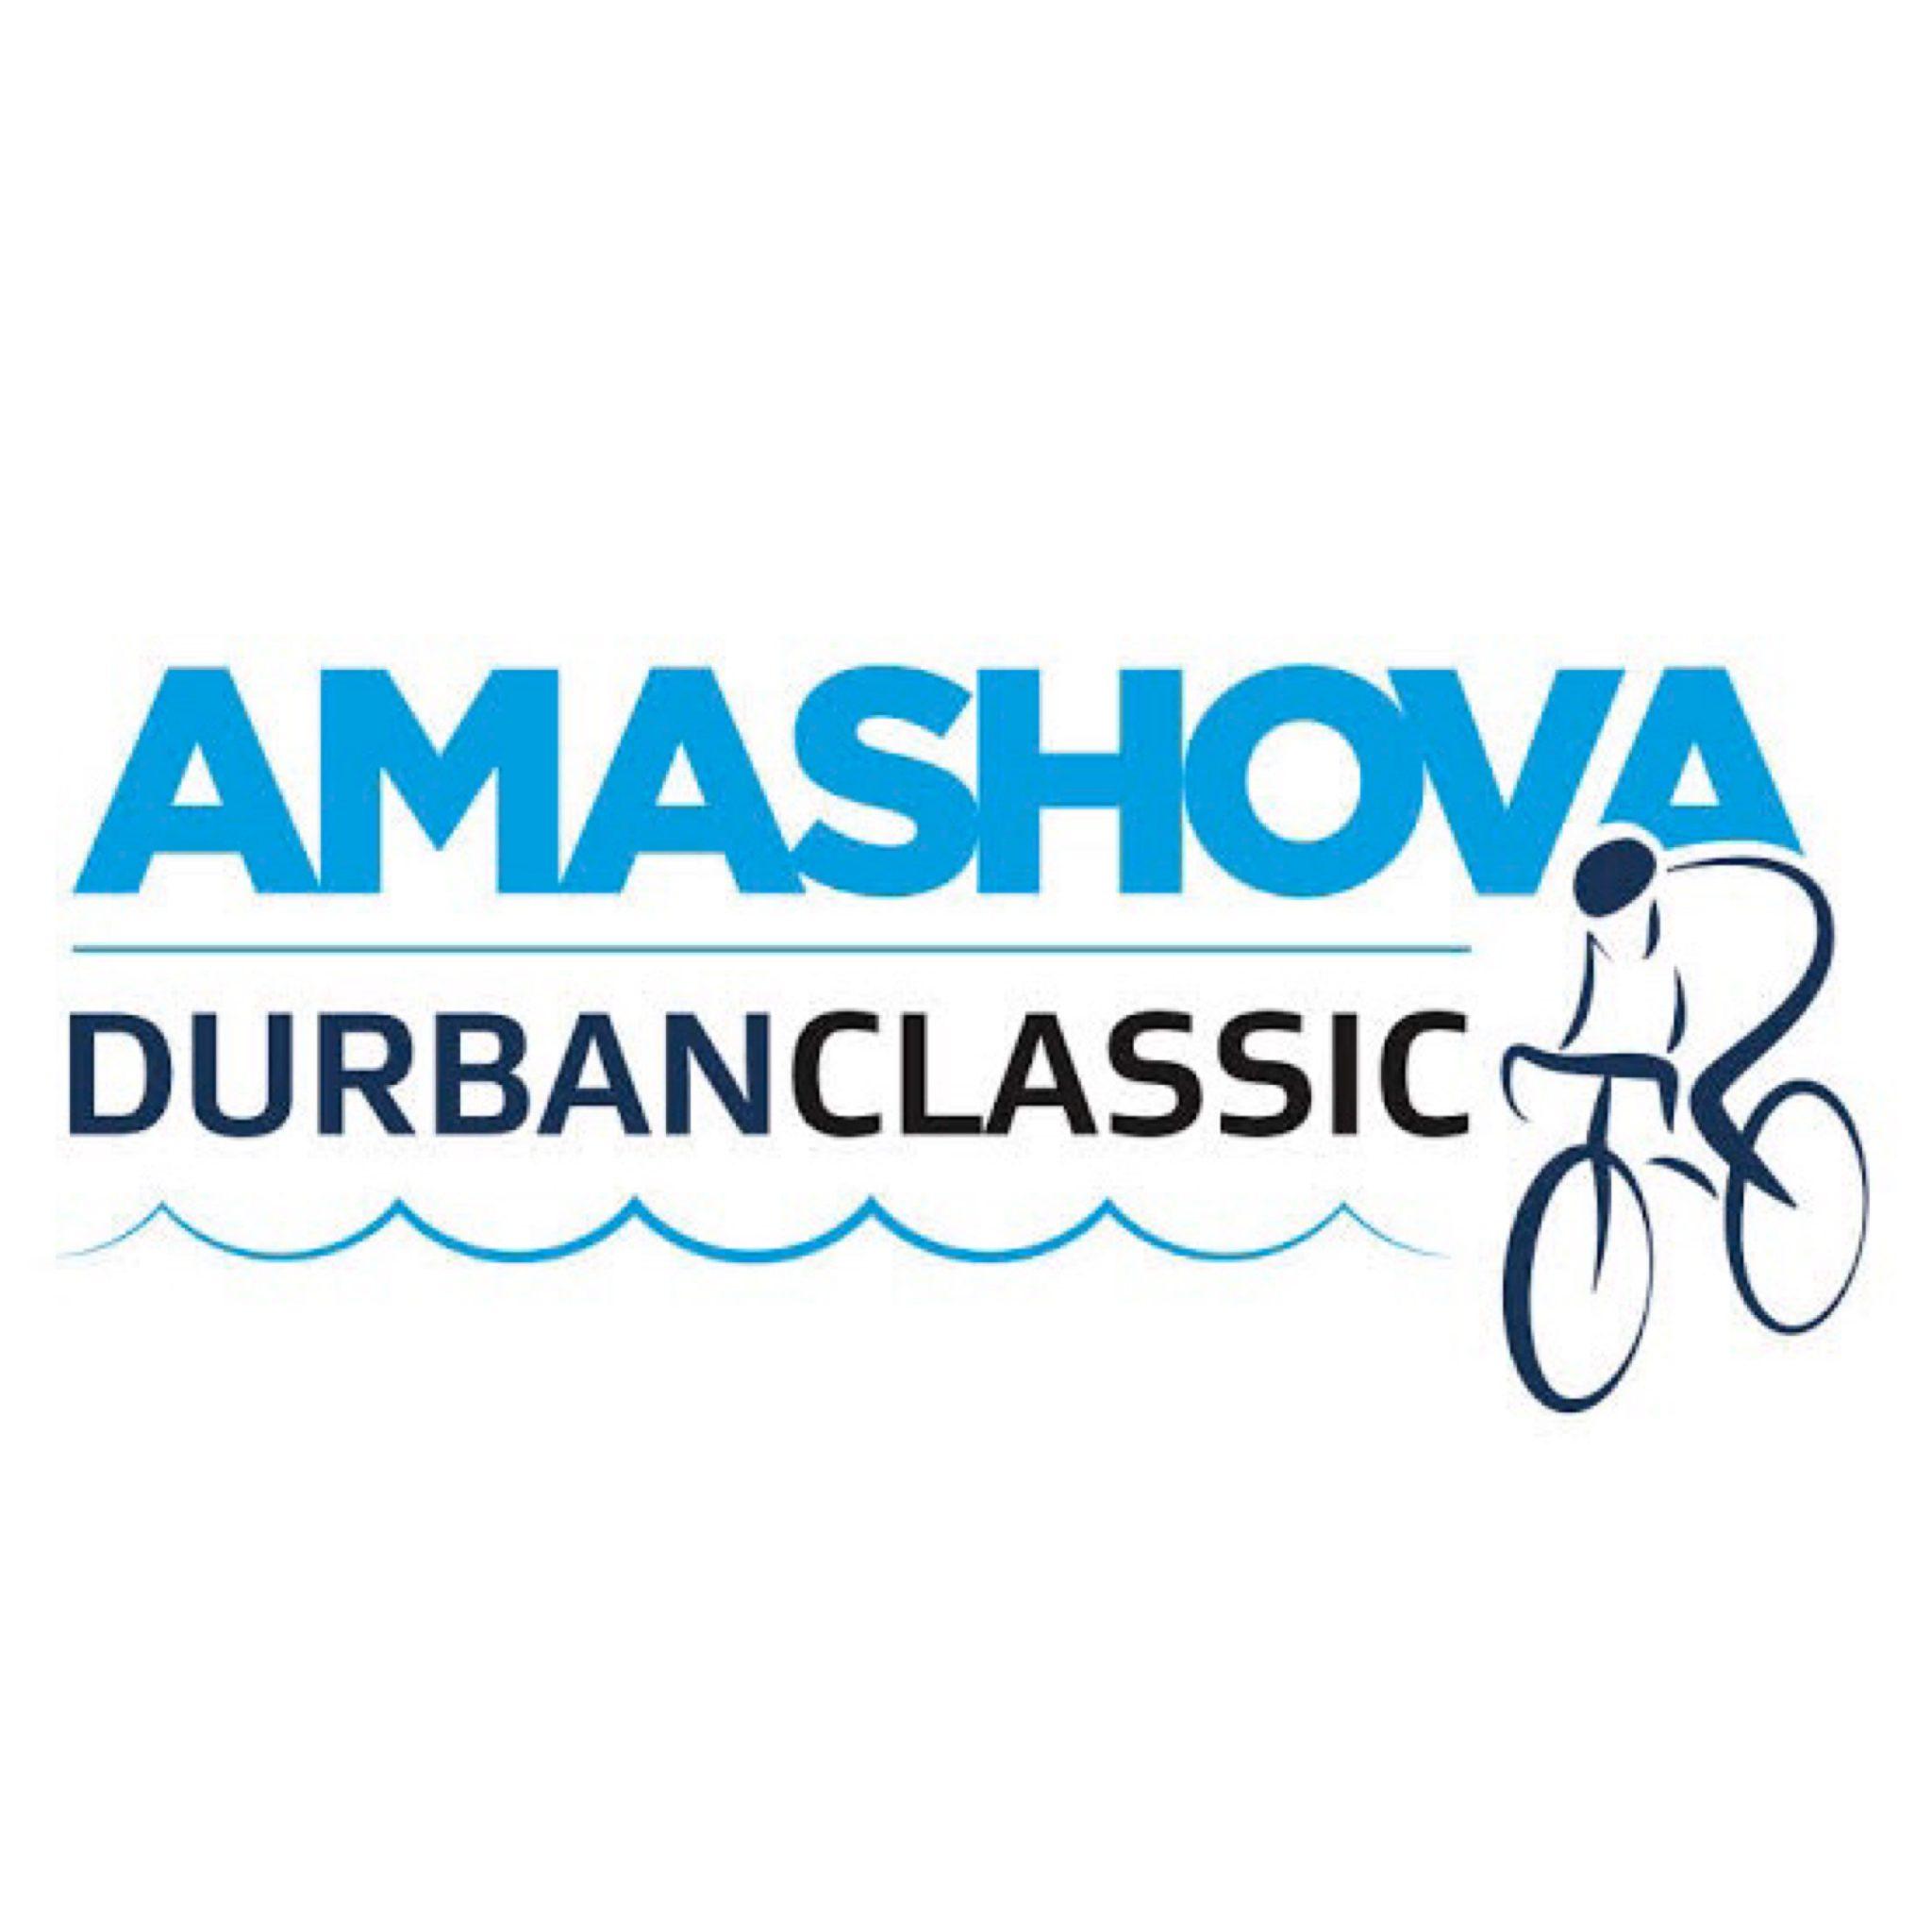 Amashova : Brand Short Description Type Here.